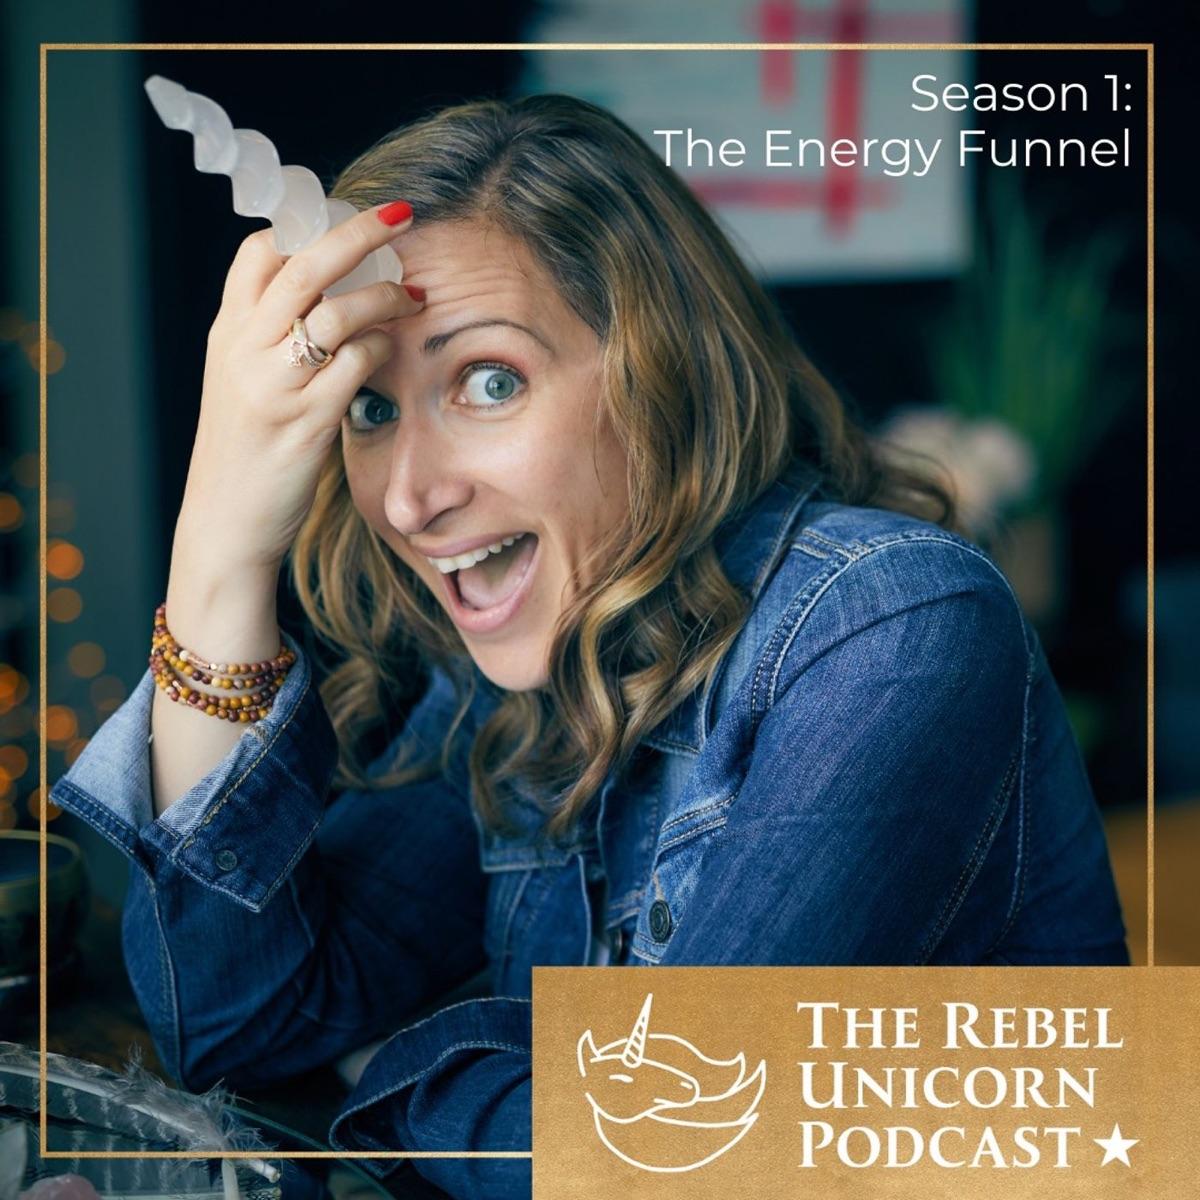 The Rebel Unicorns Podcast